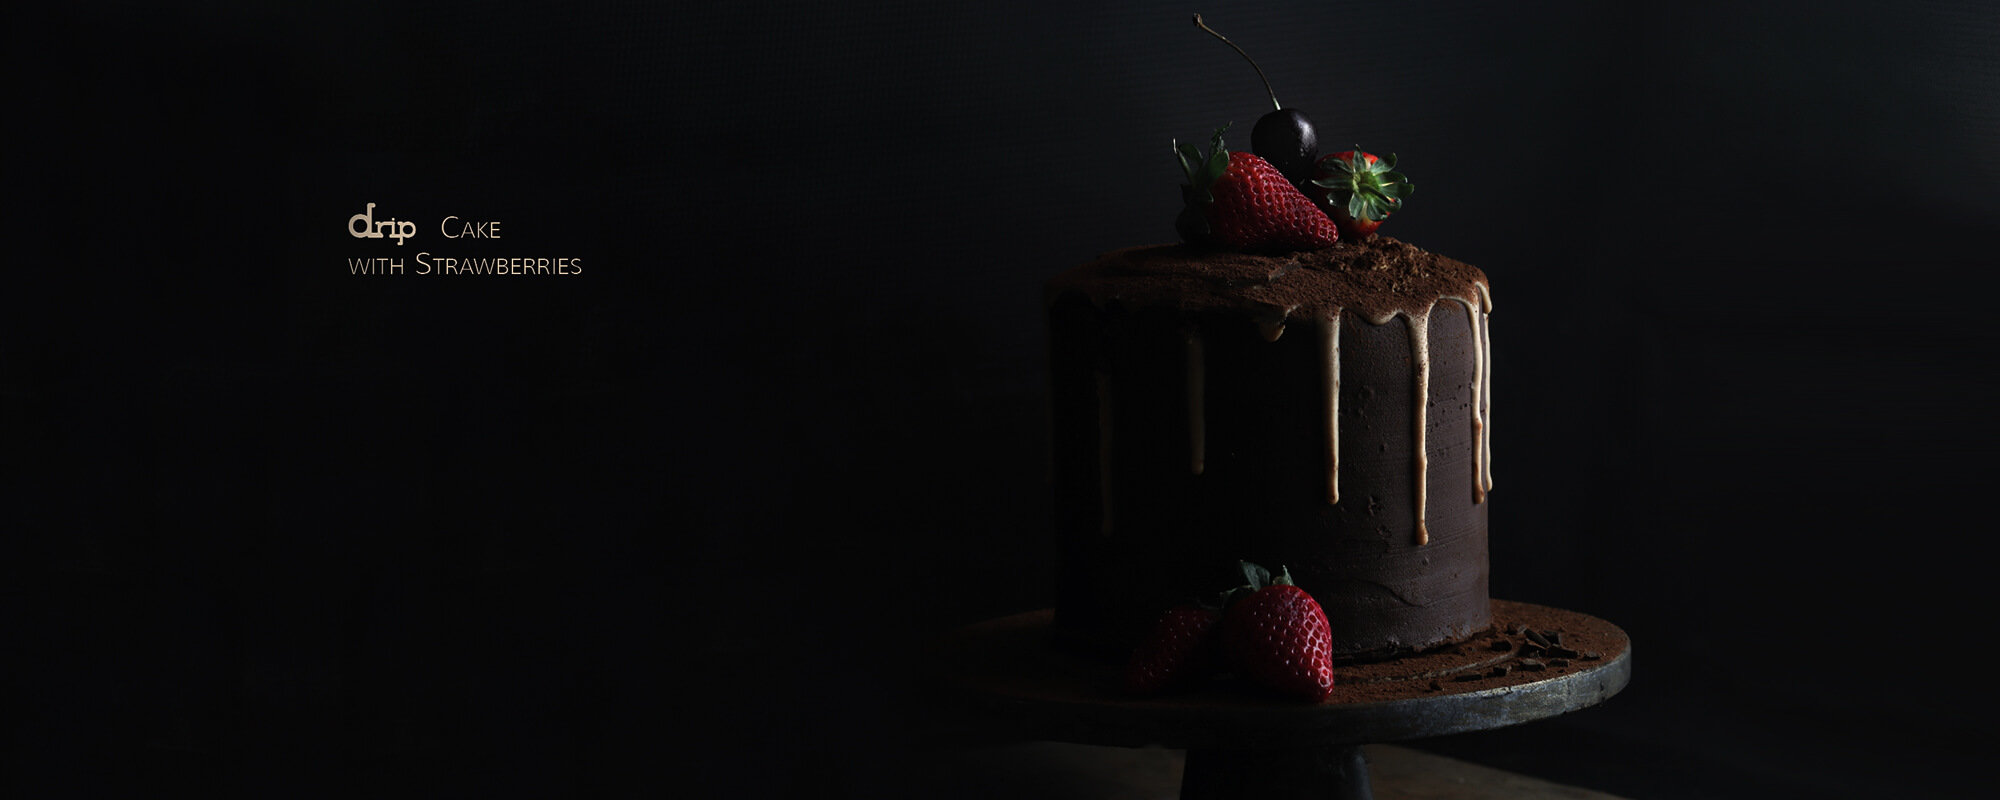 CAKE-DESIGN-DRIP-CAKE-WITH-STRAWBERRIES